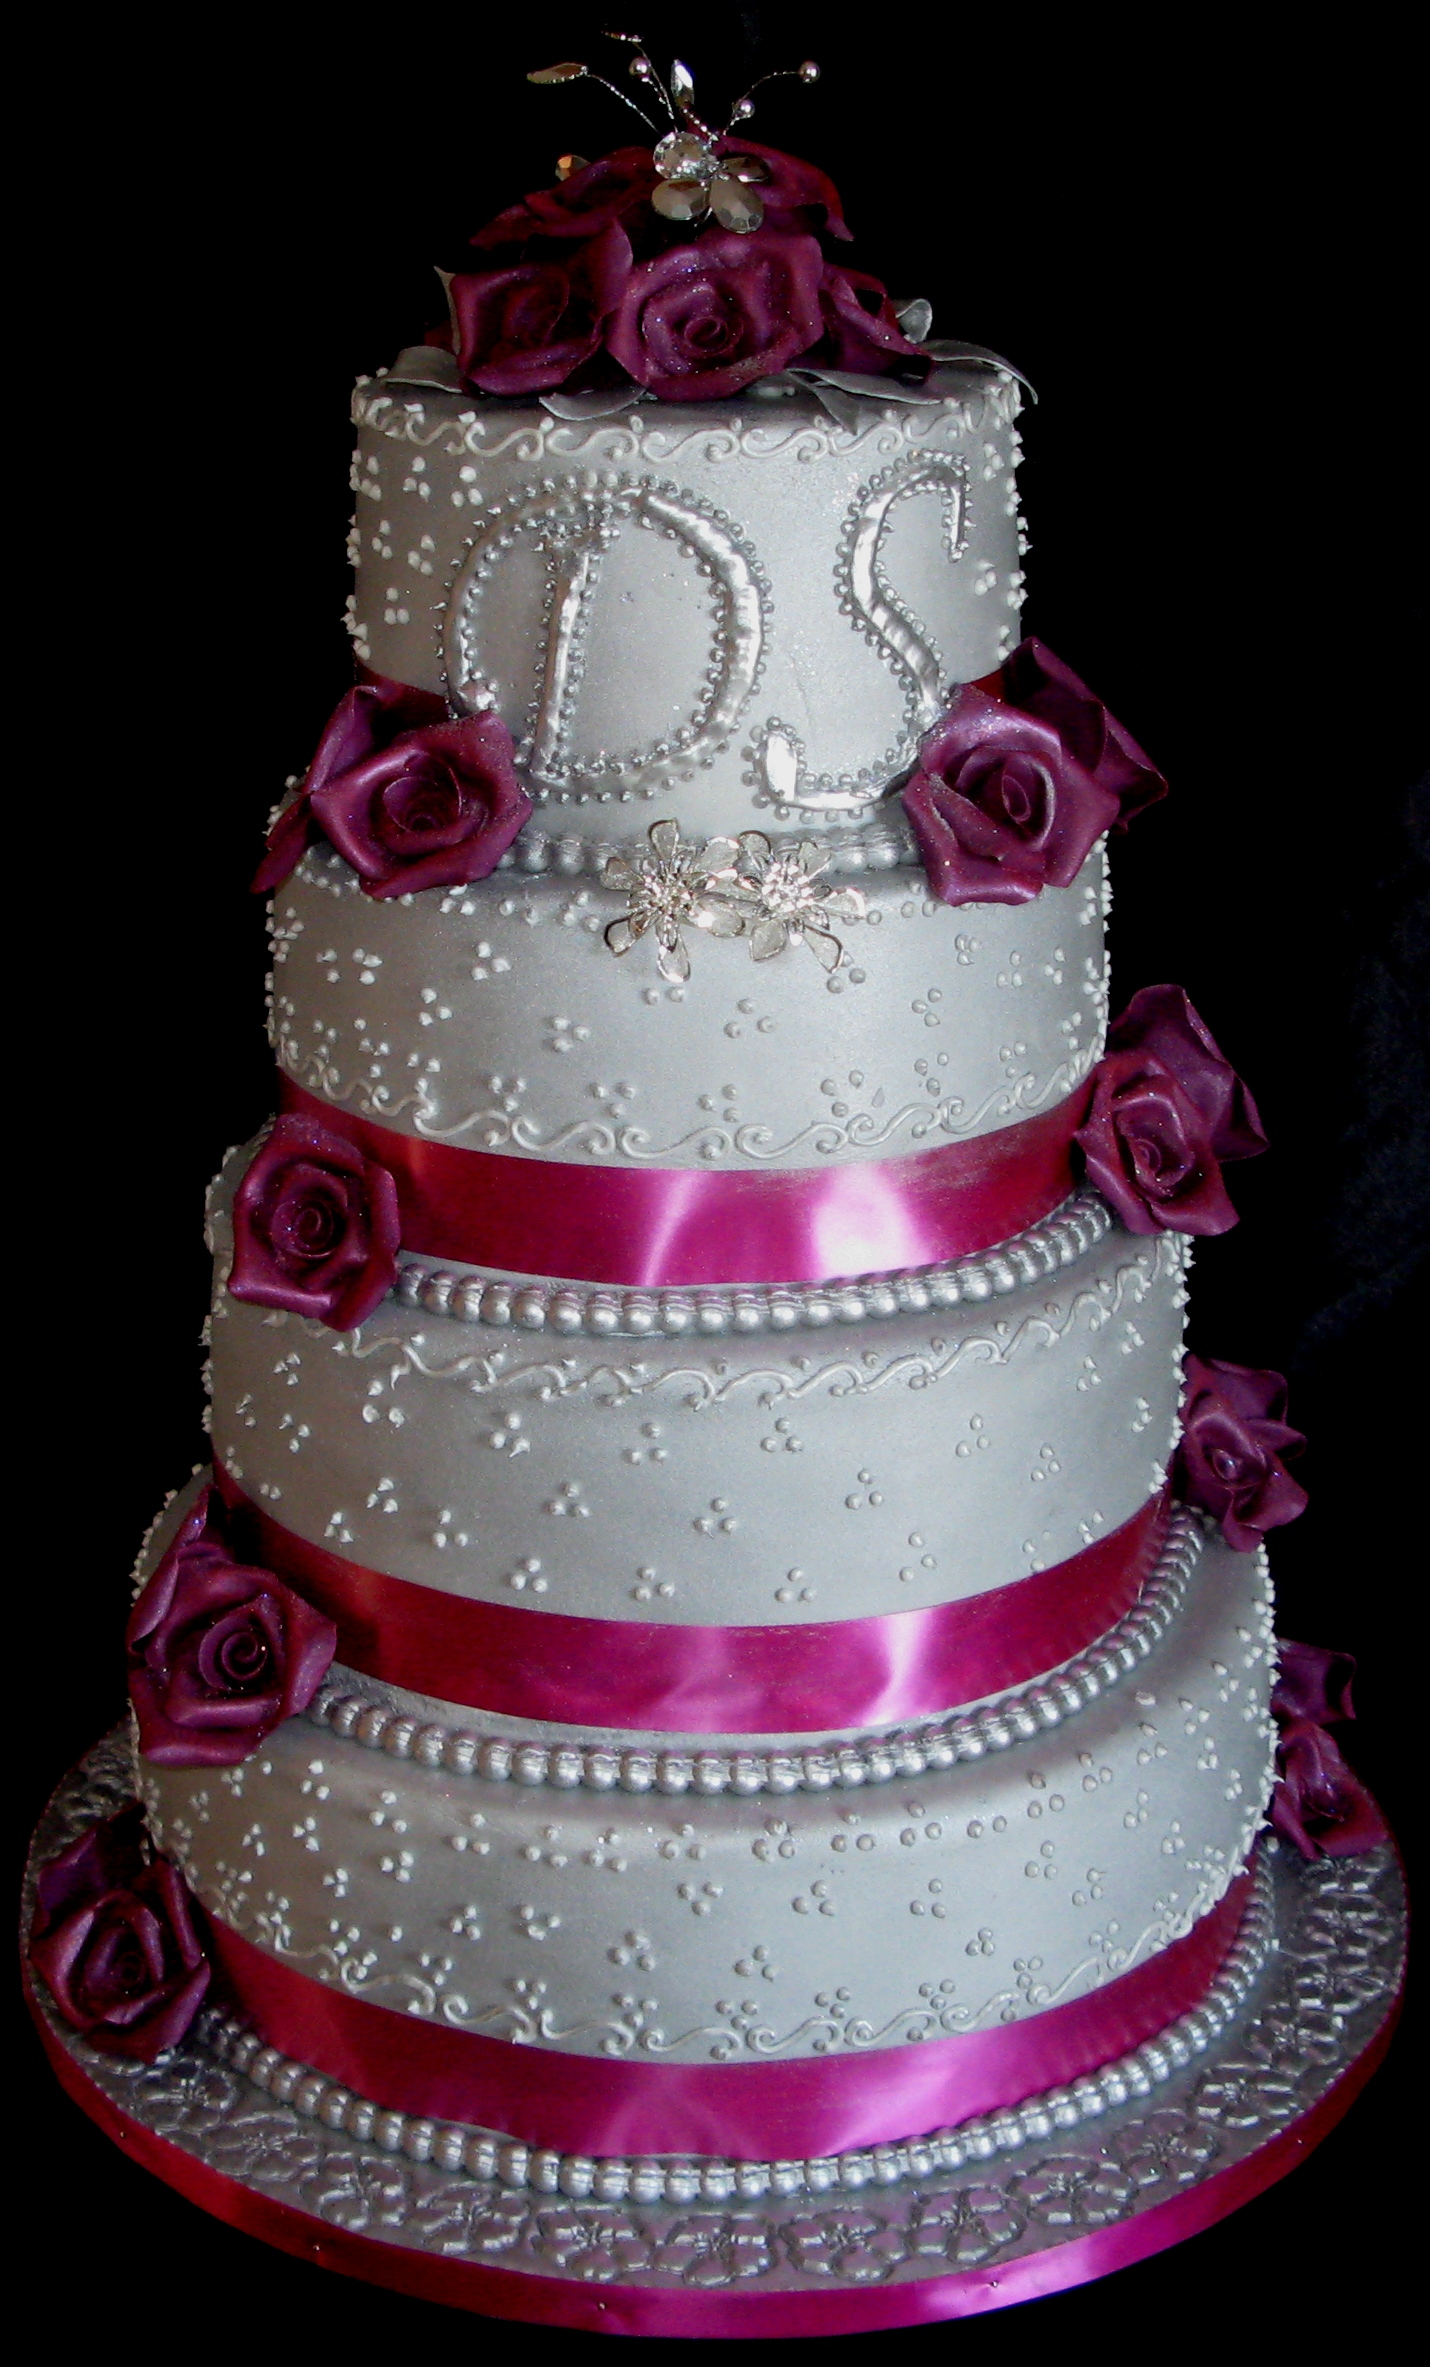 Four Tier Wedding Cake Roses Cake Studio Botswana